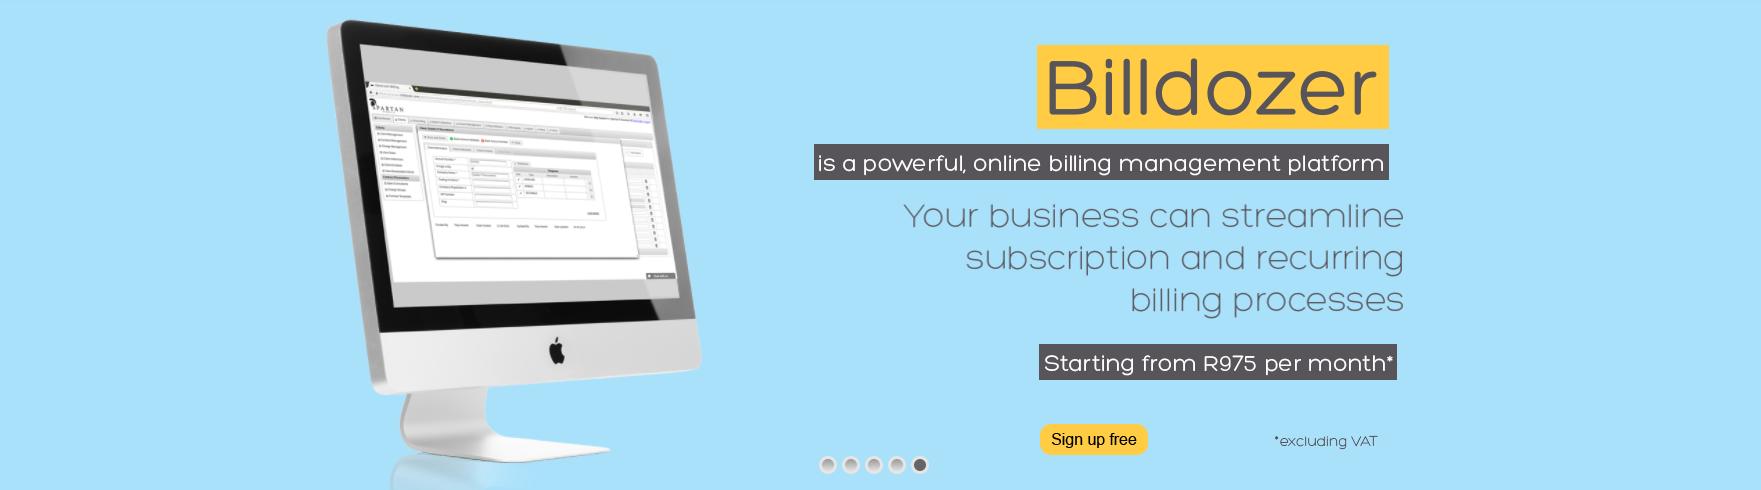 billdozer online recurring billing system